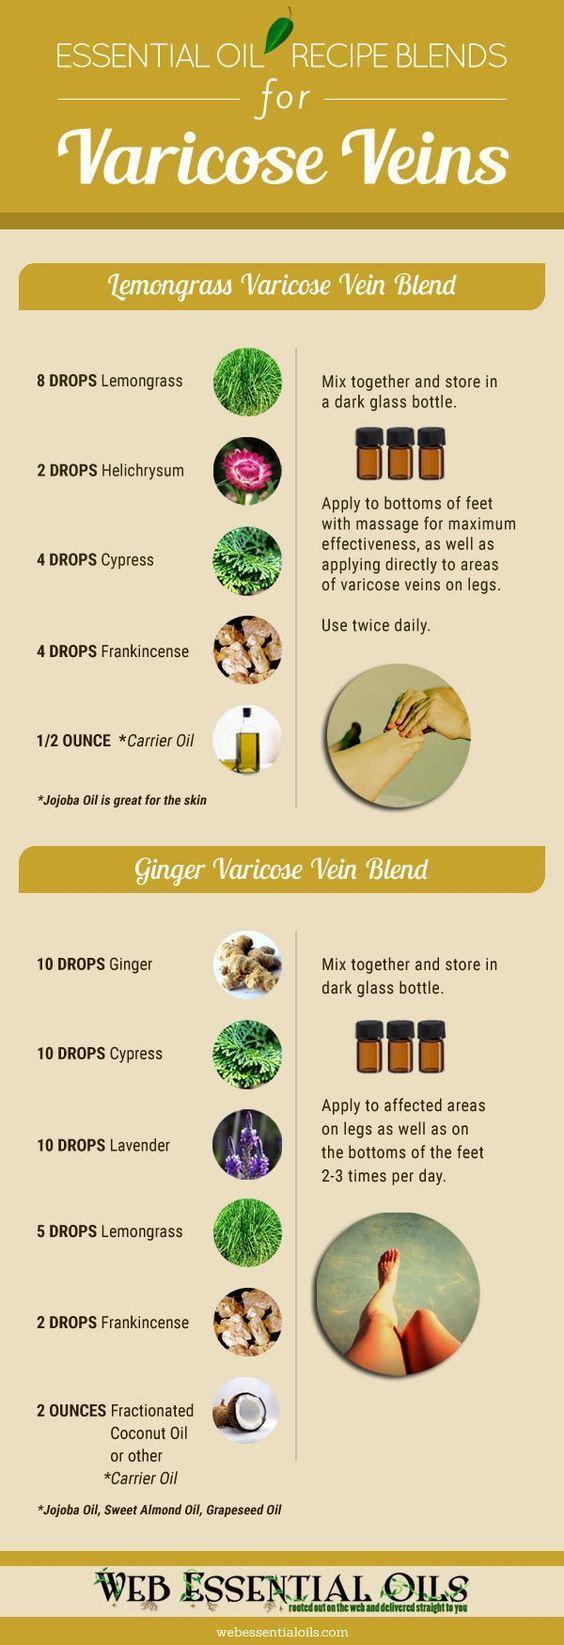 Best Way To Treat Varicose Veins Naturally